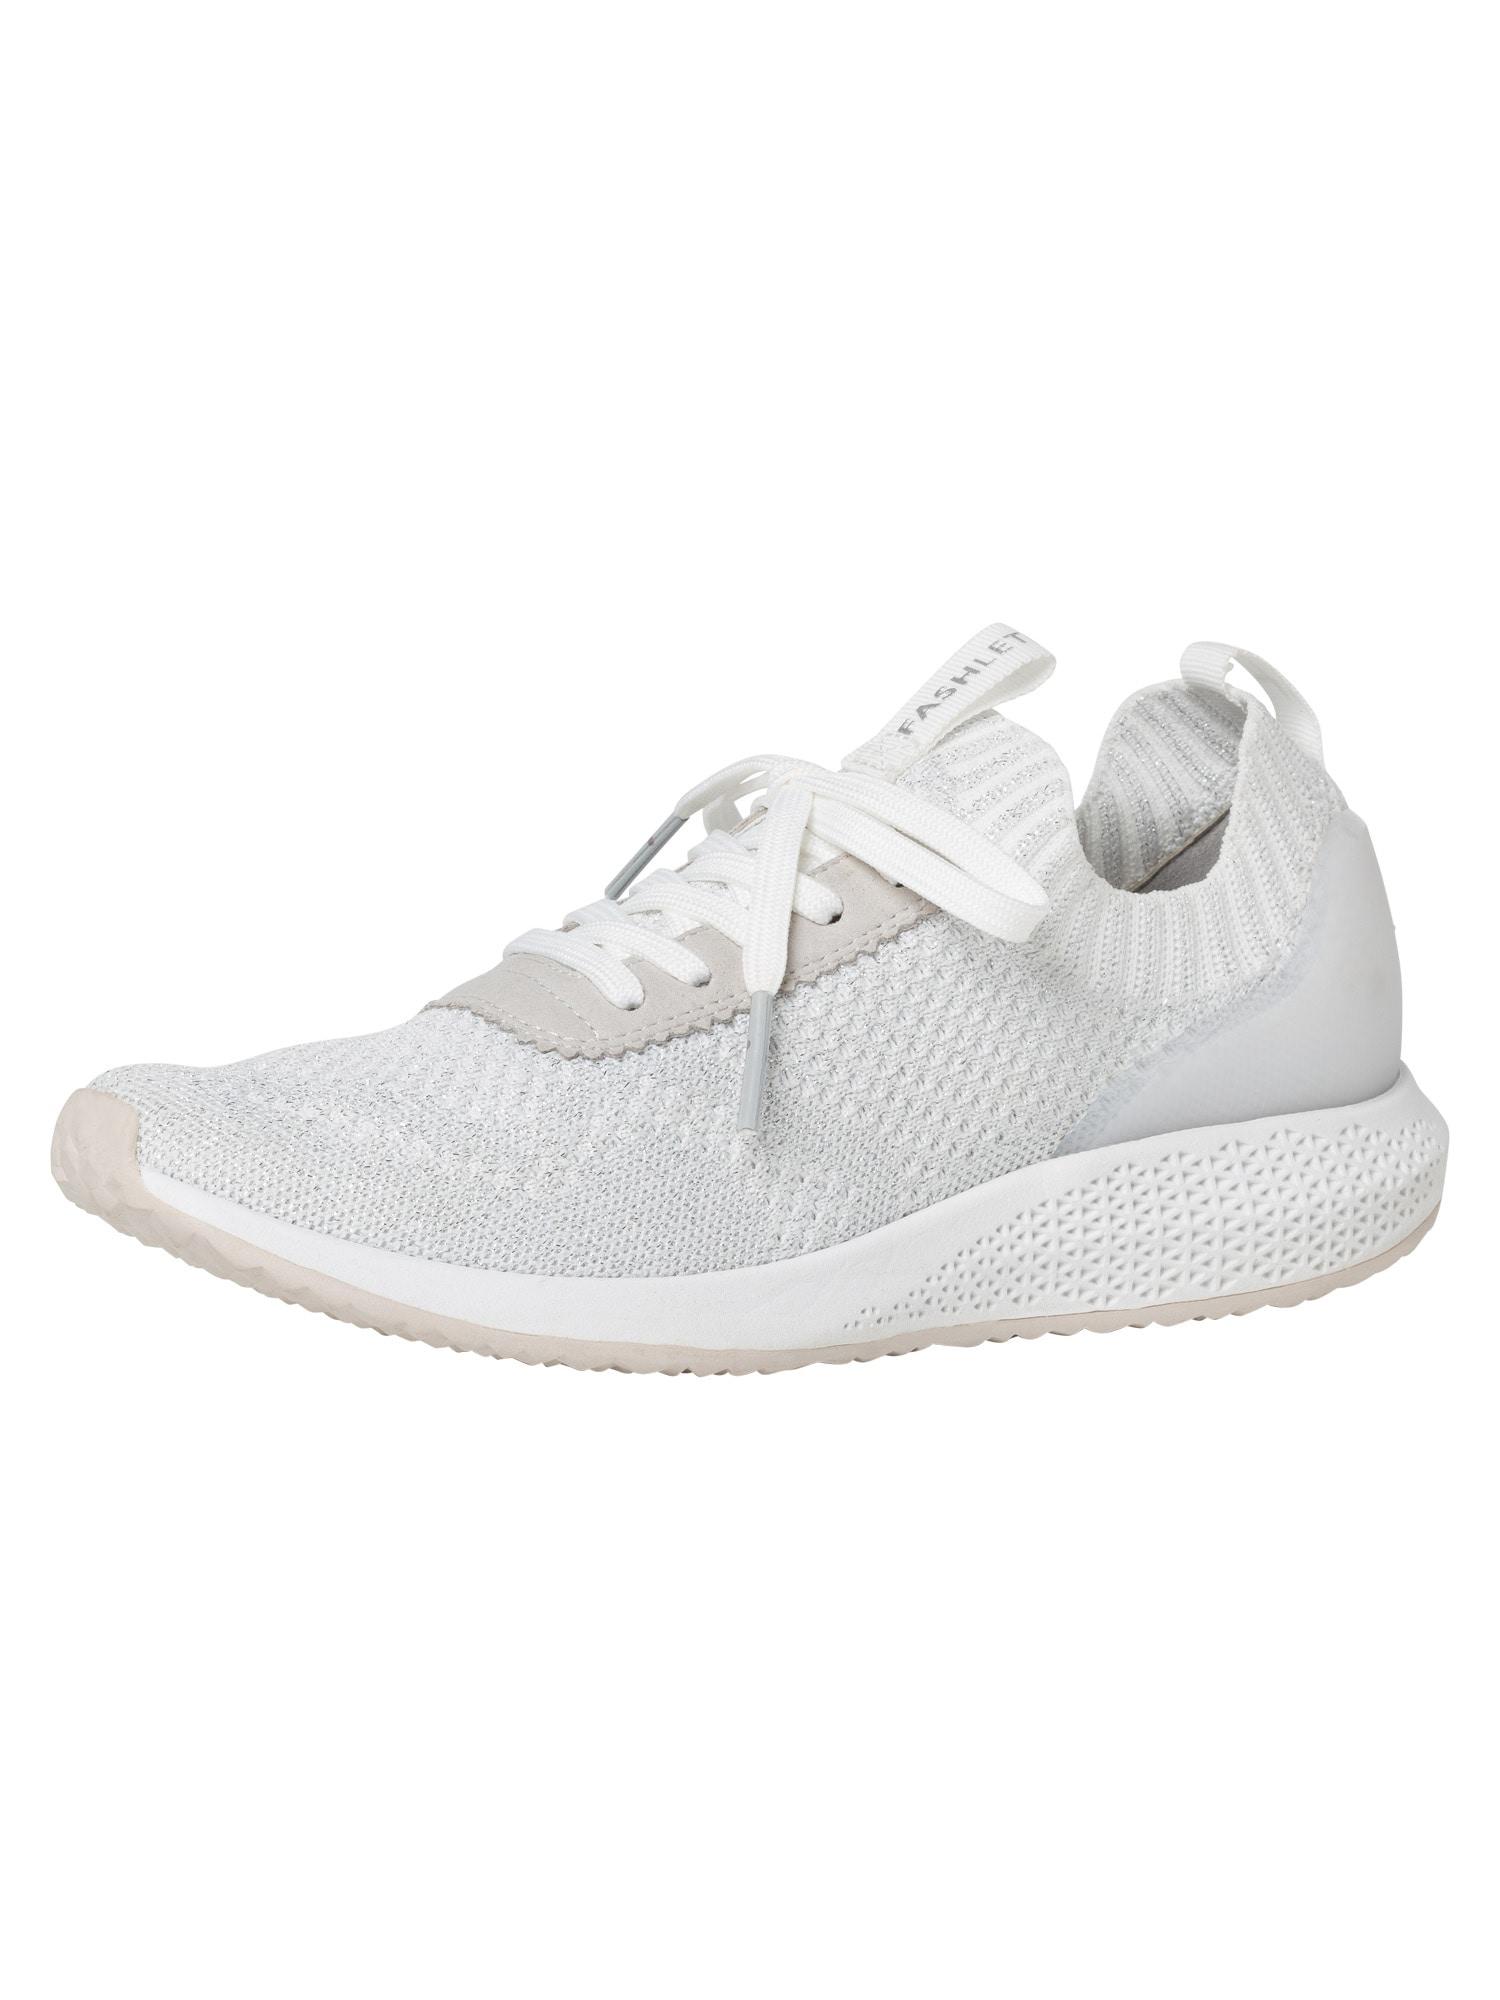 Tamaris Fashletics Sneaker pilka